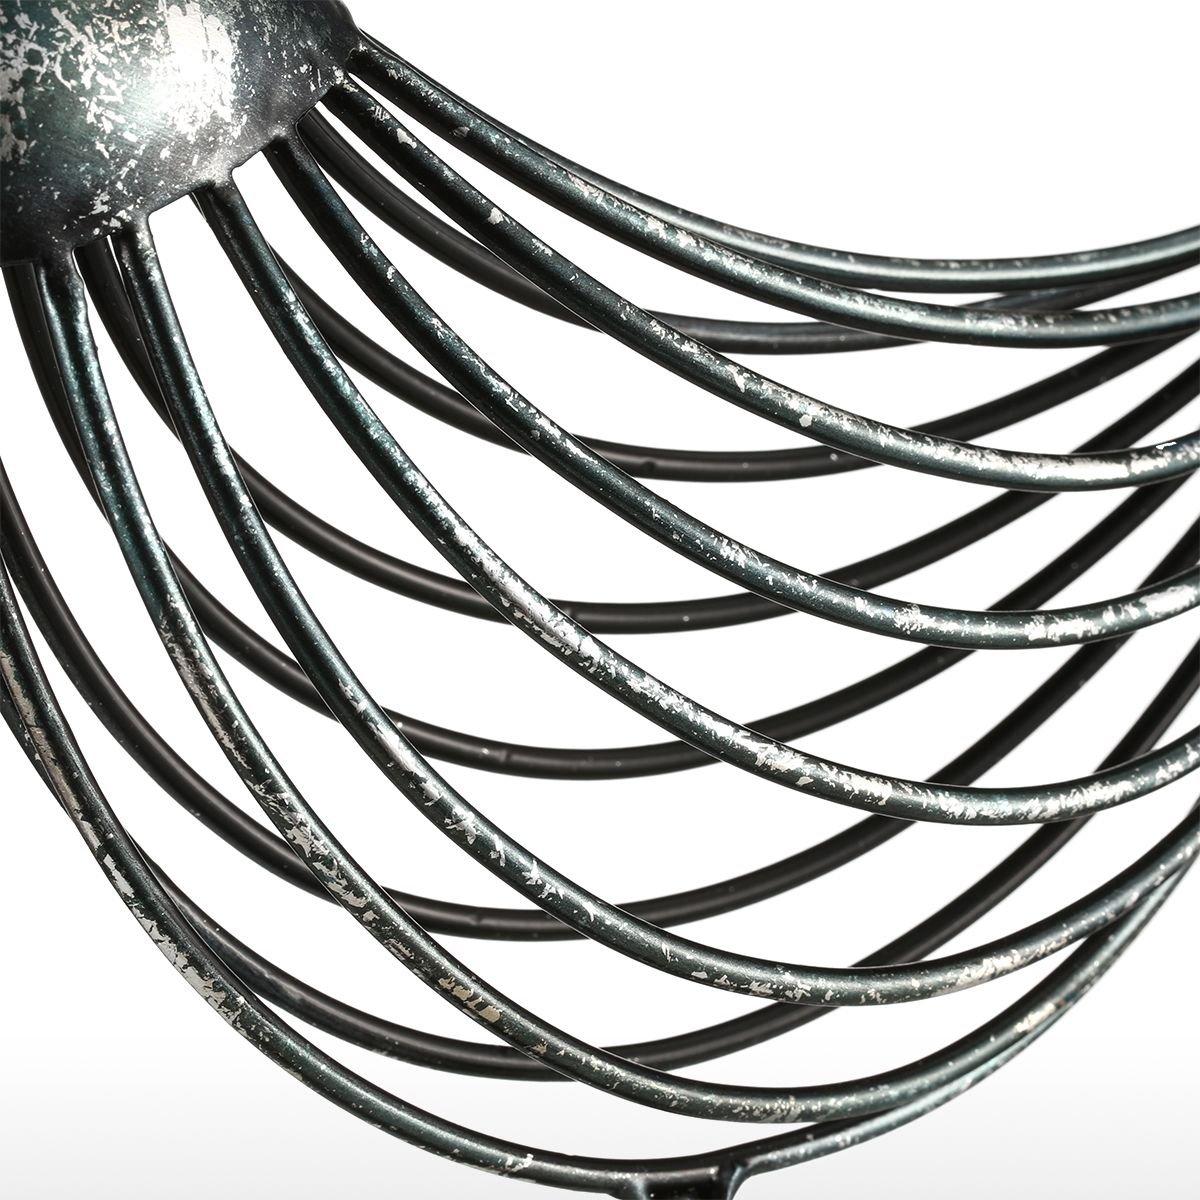 Tooarts Metal Sculpture Iron Wire Bird Animal Ornament Modern Sculpture Home Decoration Creative Sculpture Bird